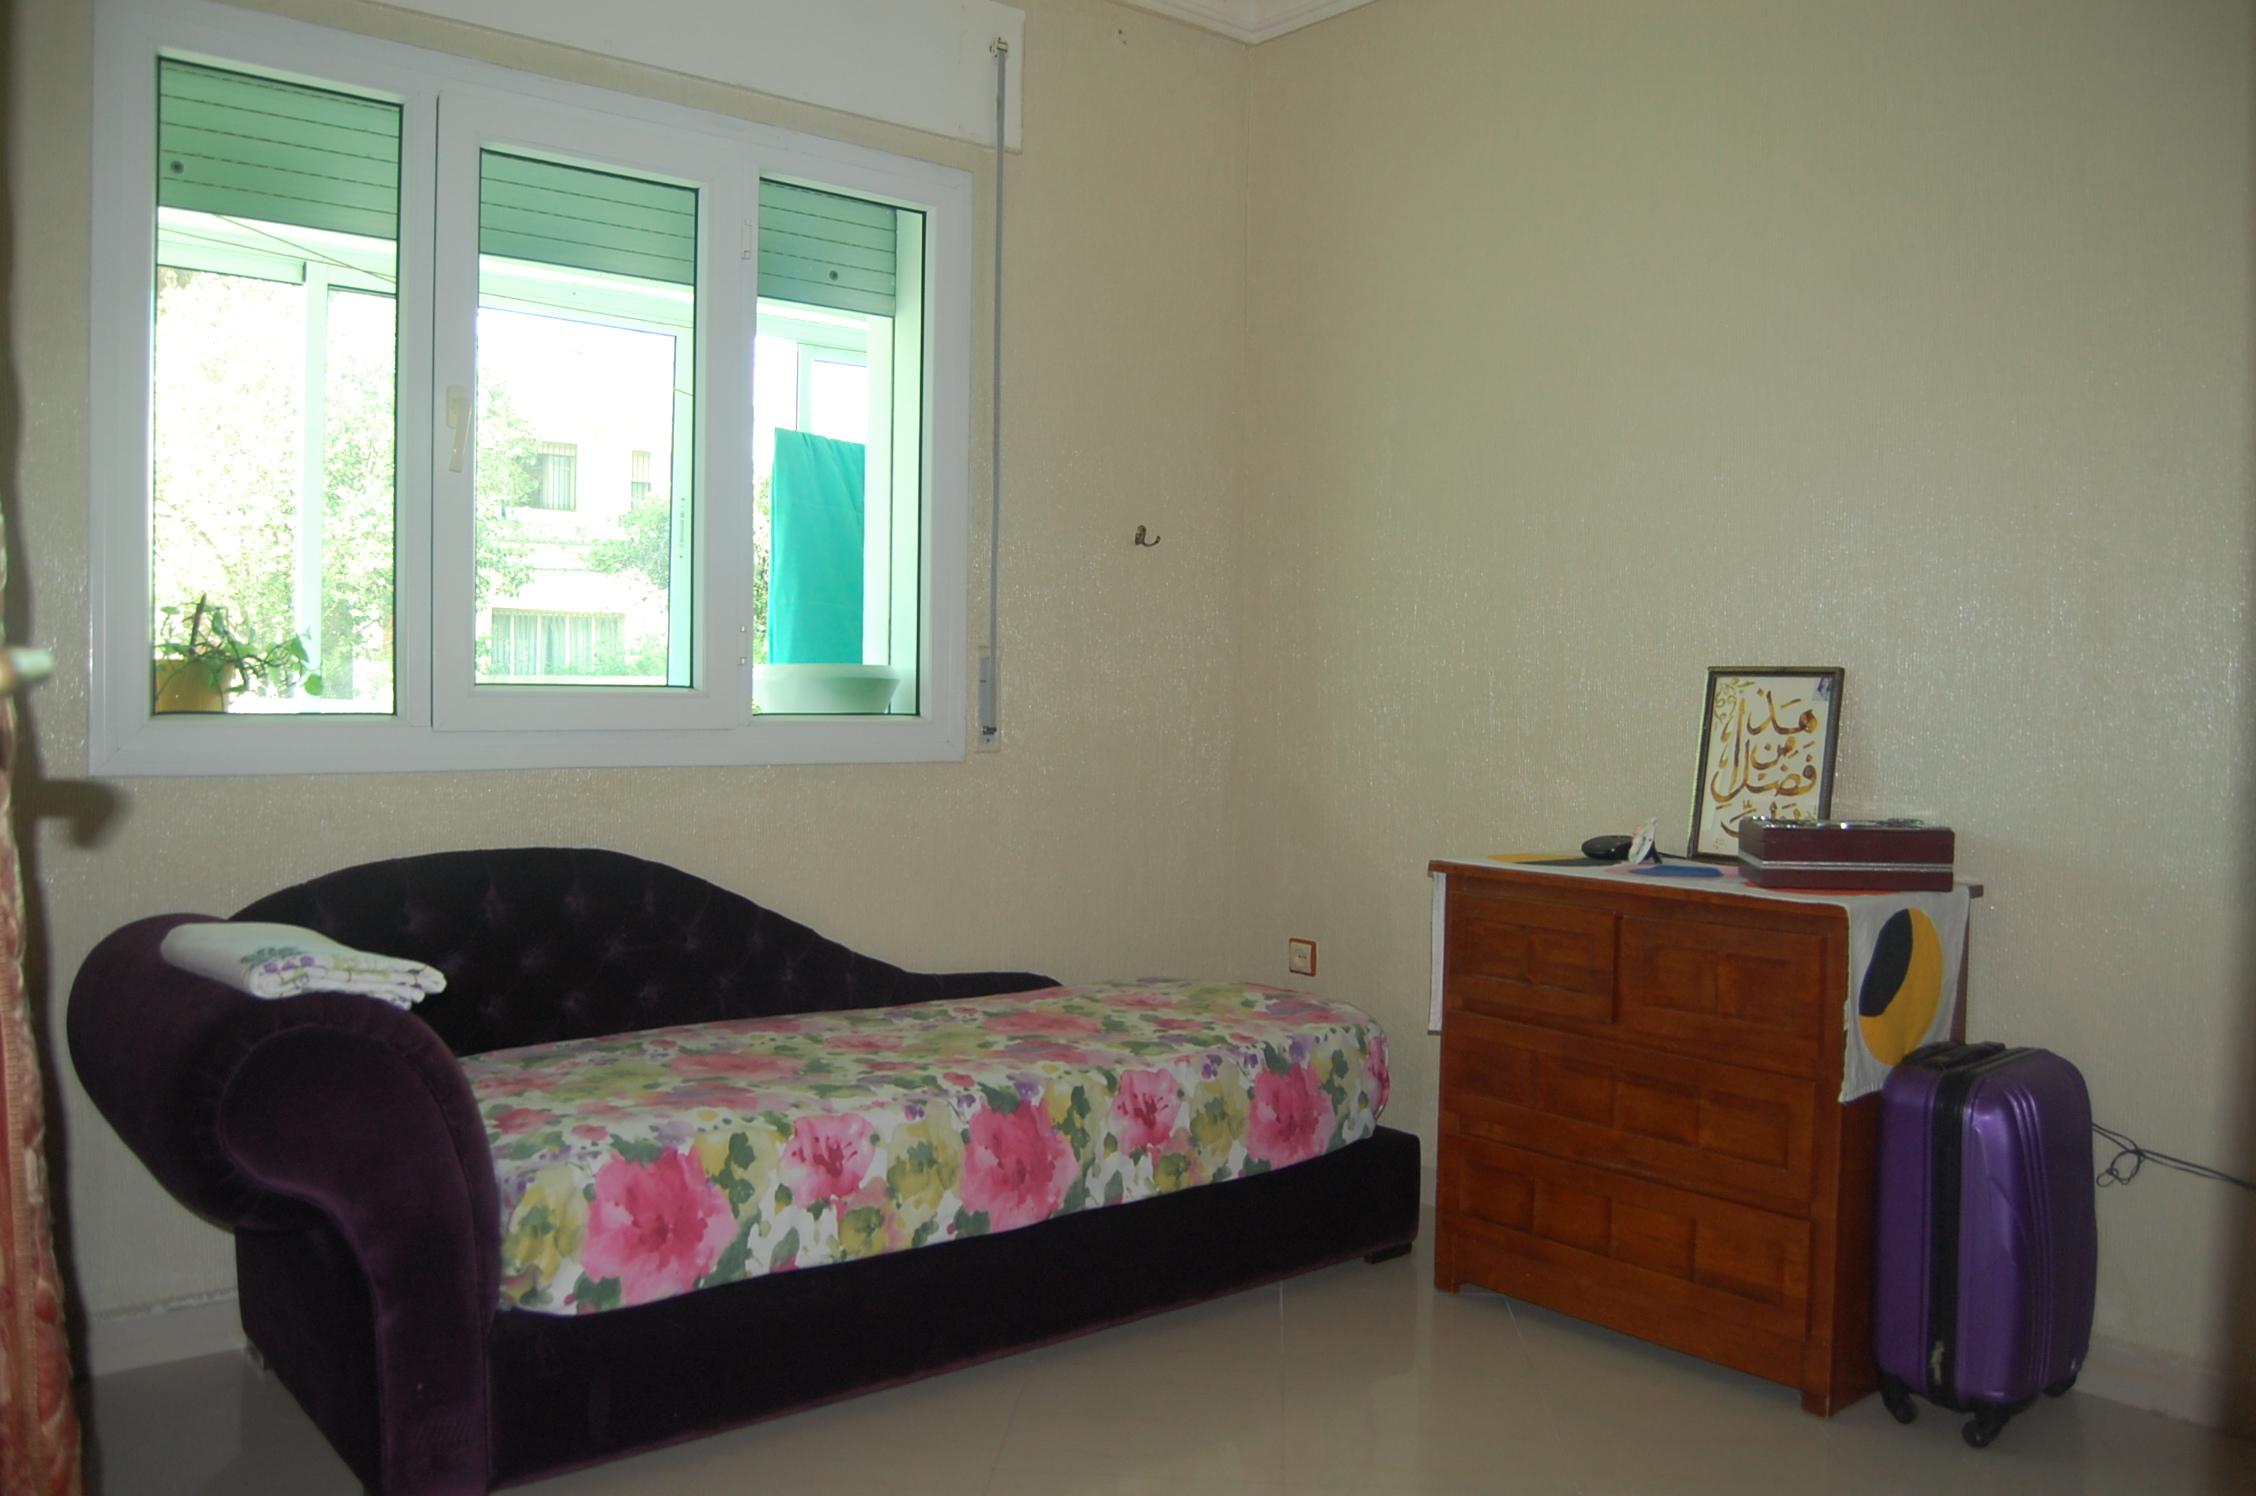 5-vente-appartement-tanger-route-de-tetouan-chambre-2-va460-villart-immo